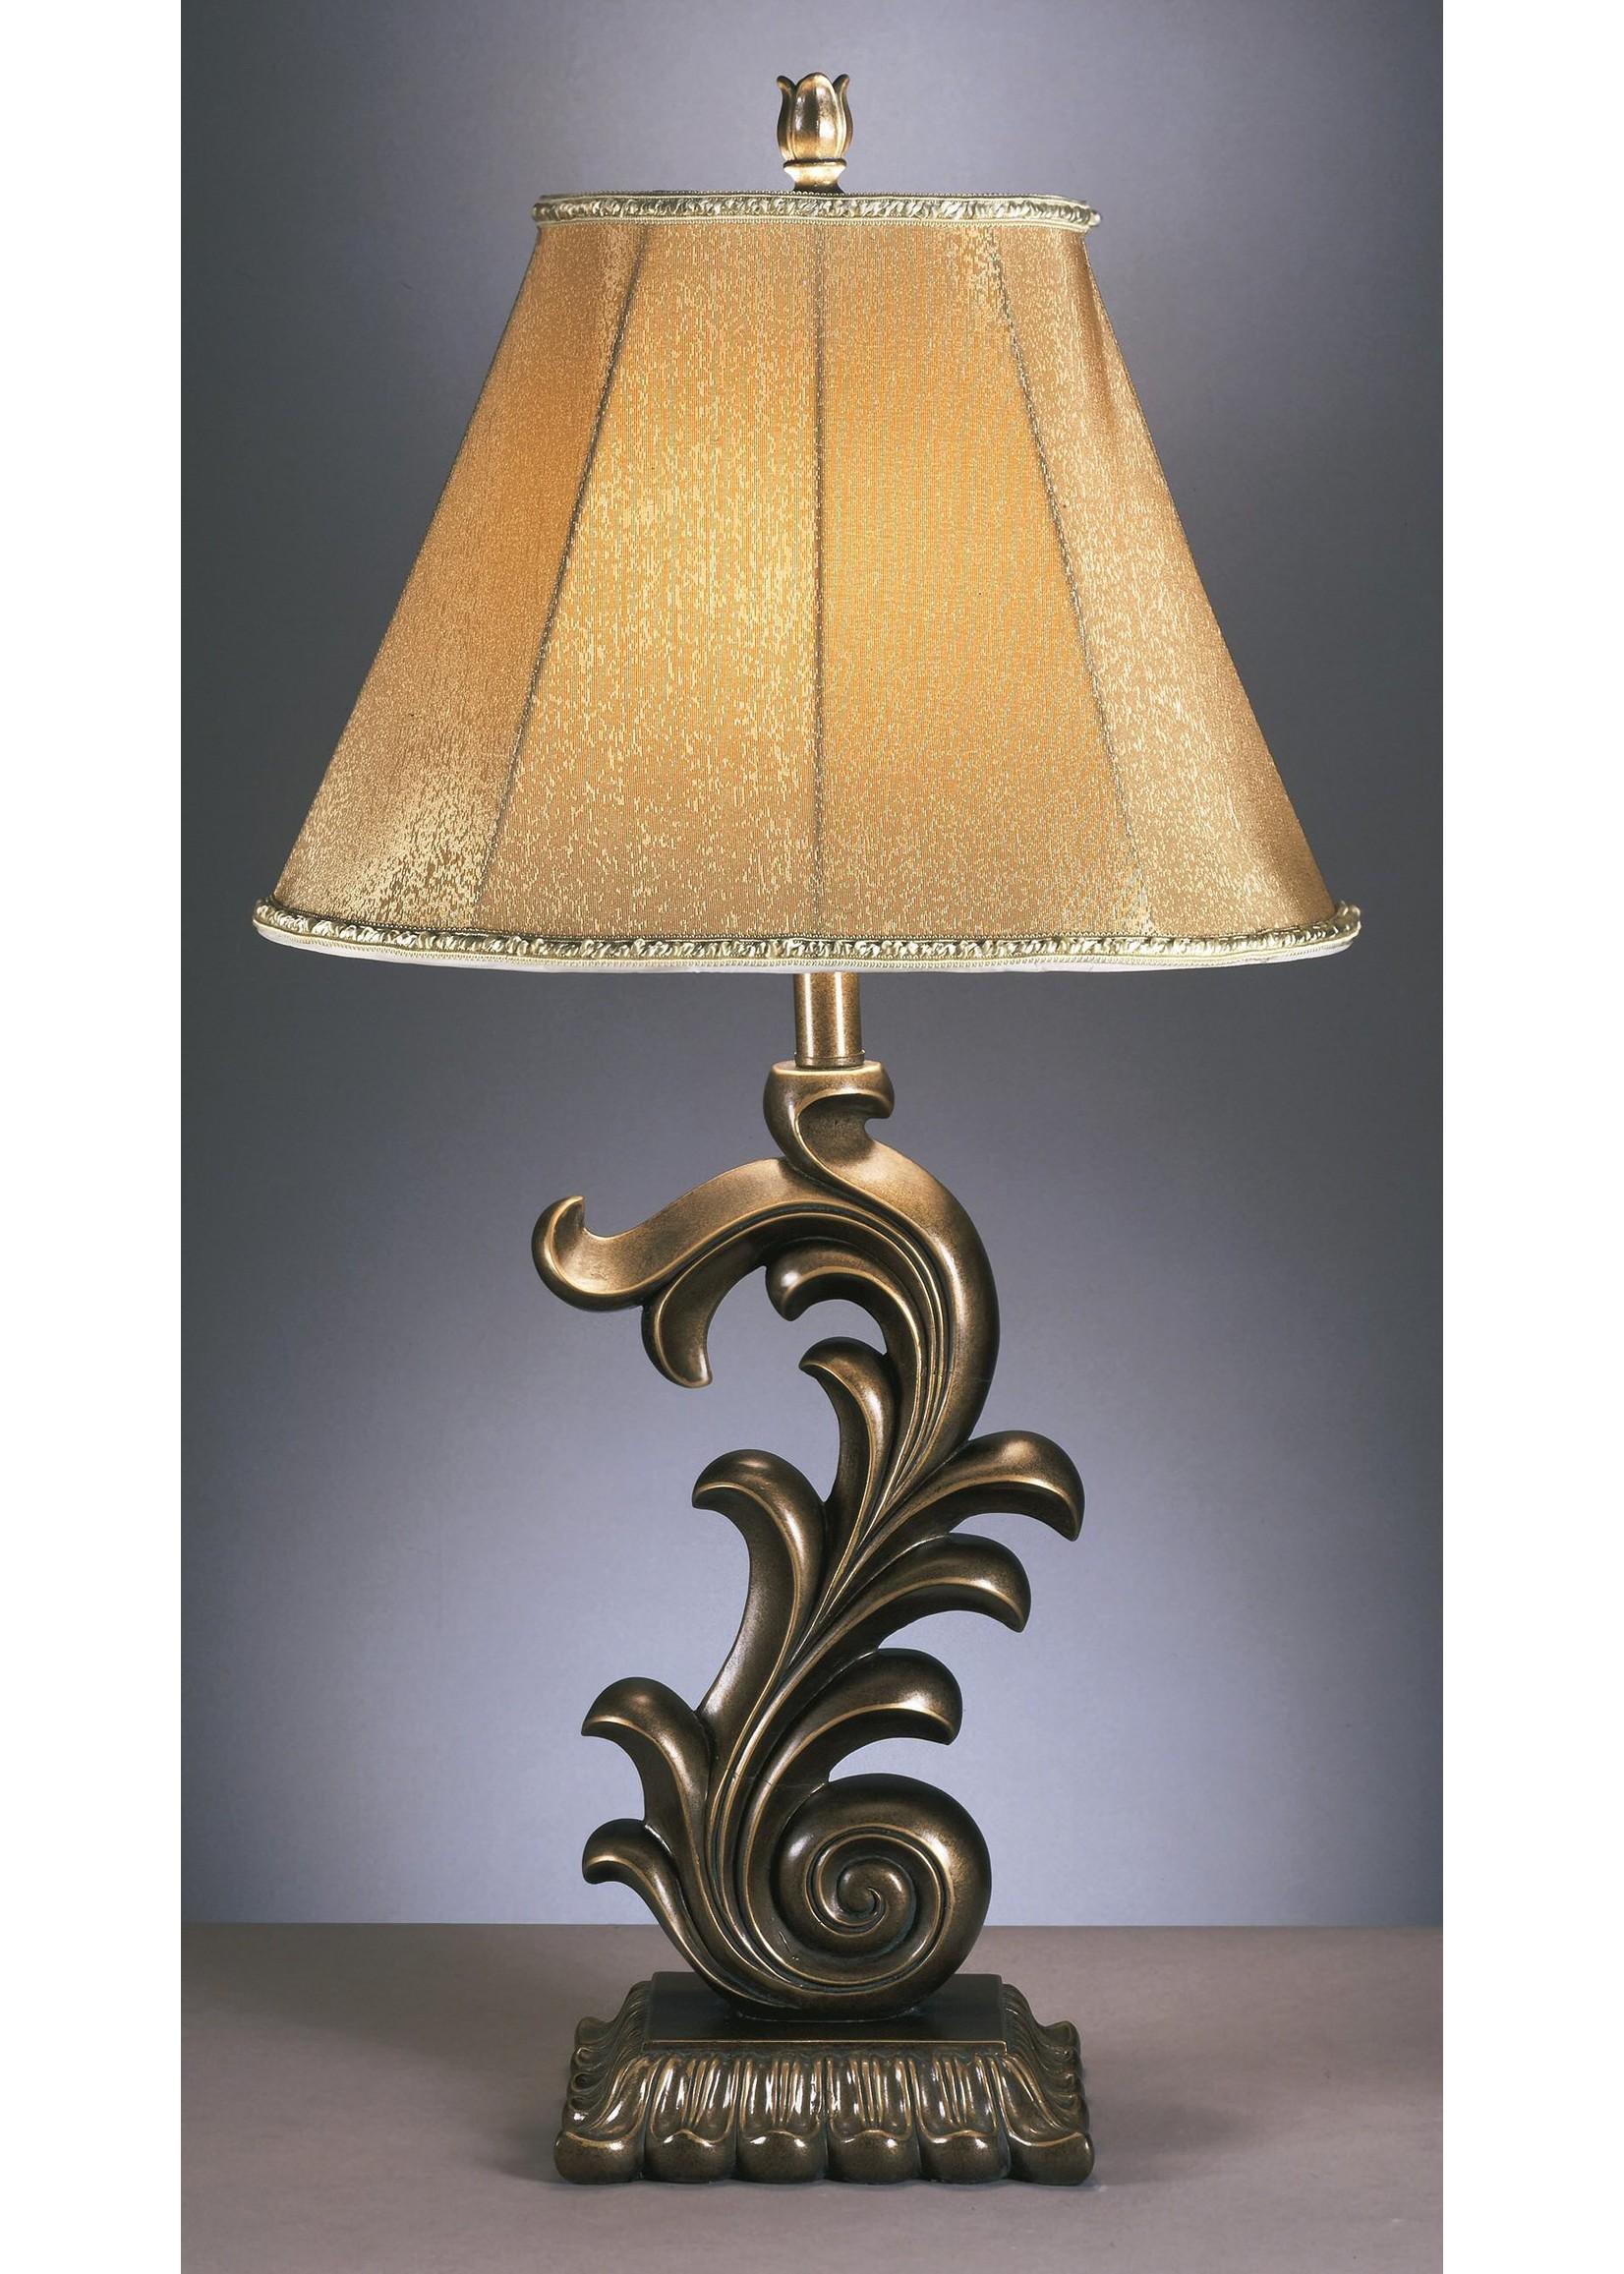 ASHLEY ELIZA TABLE LAMP IN BRONZE